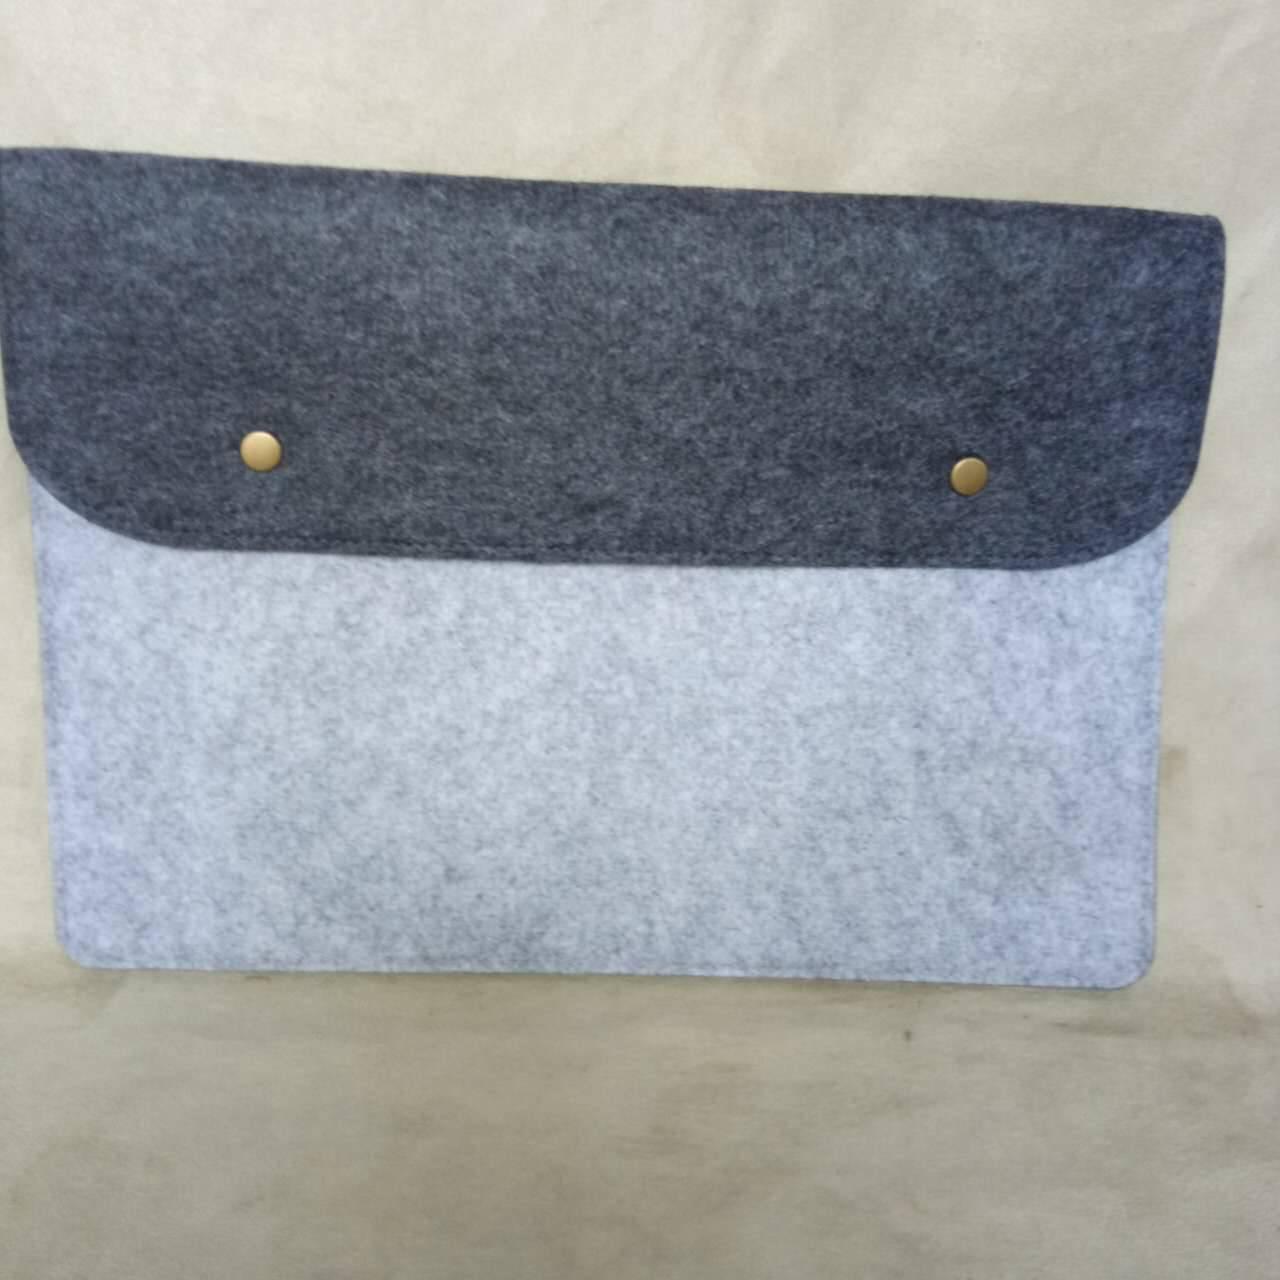 Fashion Ipad Bag with Felt Material